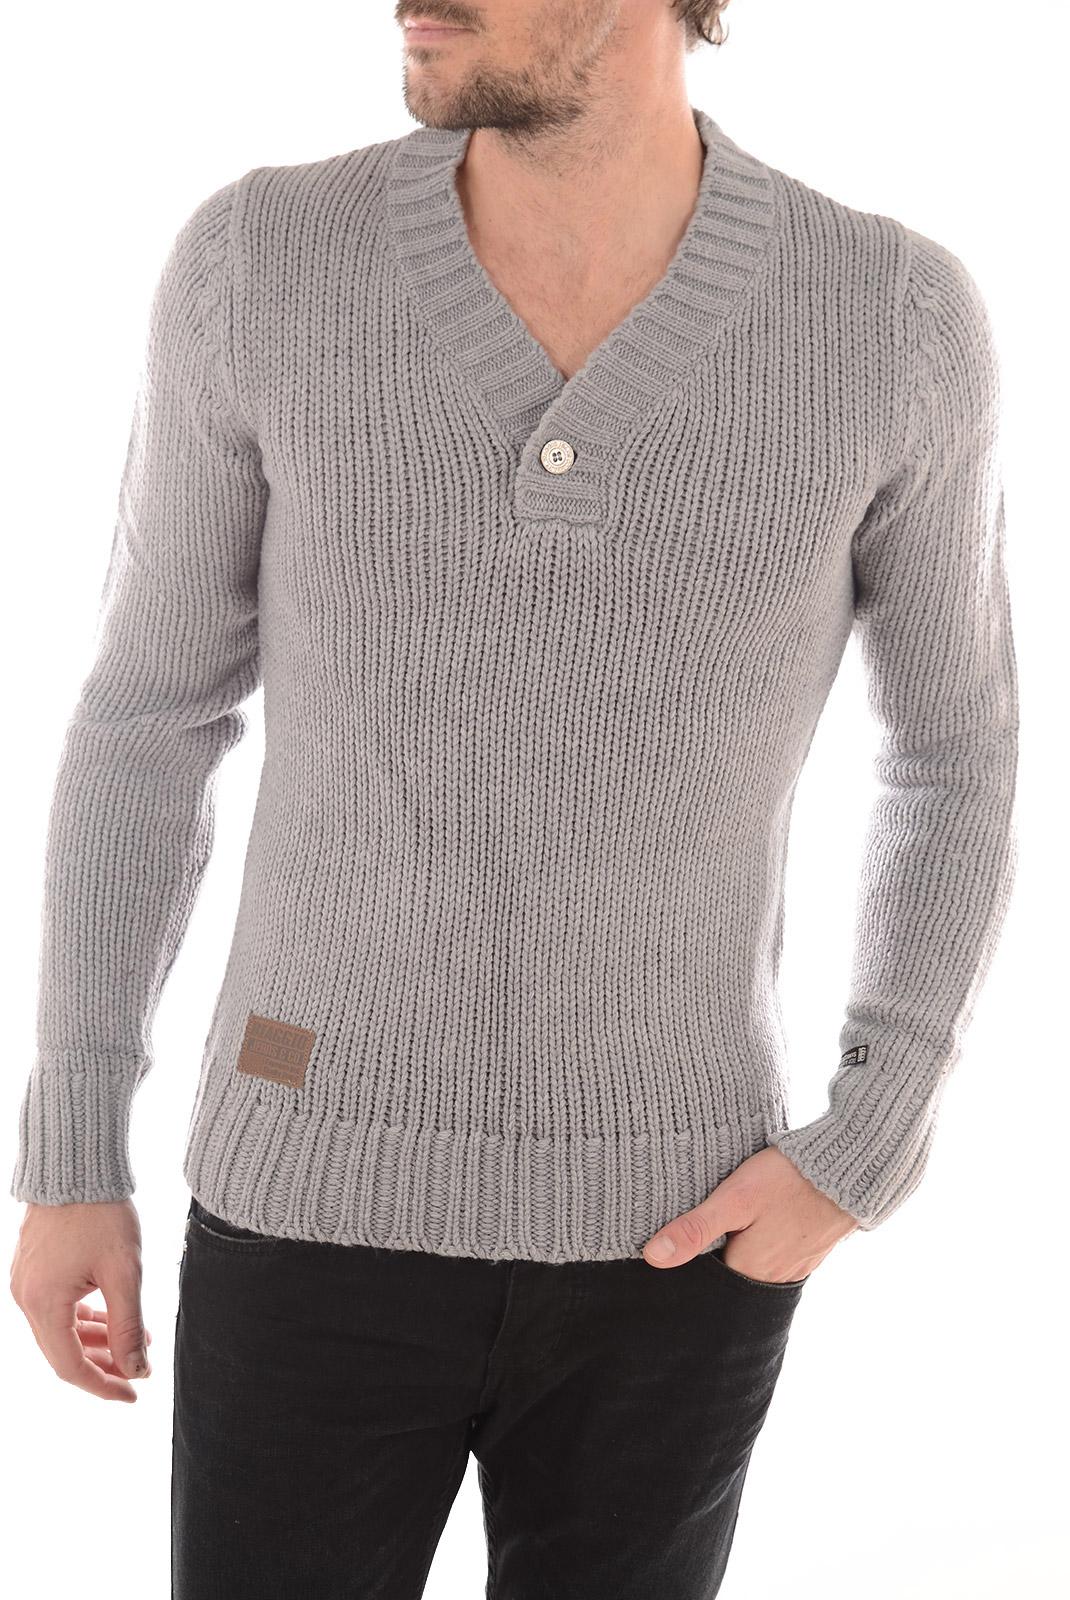 Pulls  Biaggio jeans PUVROK LT GREY MEL